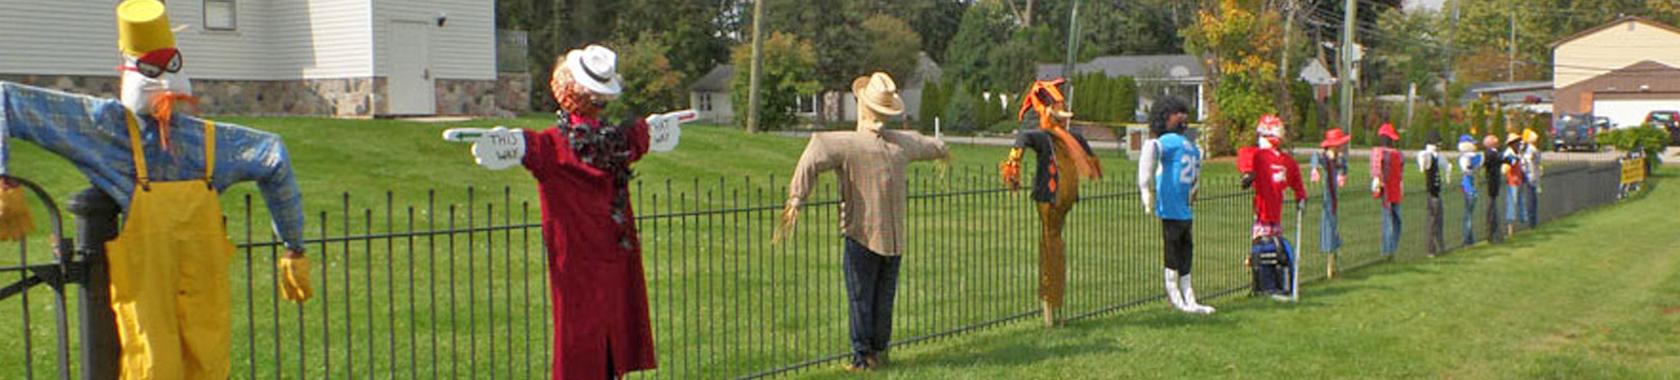 Scarecrow Row